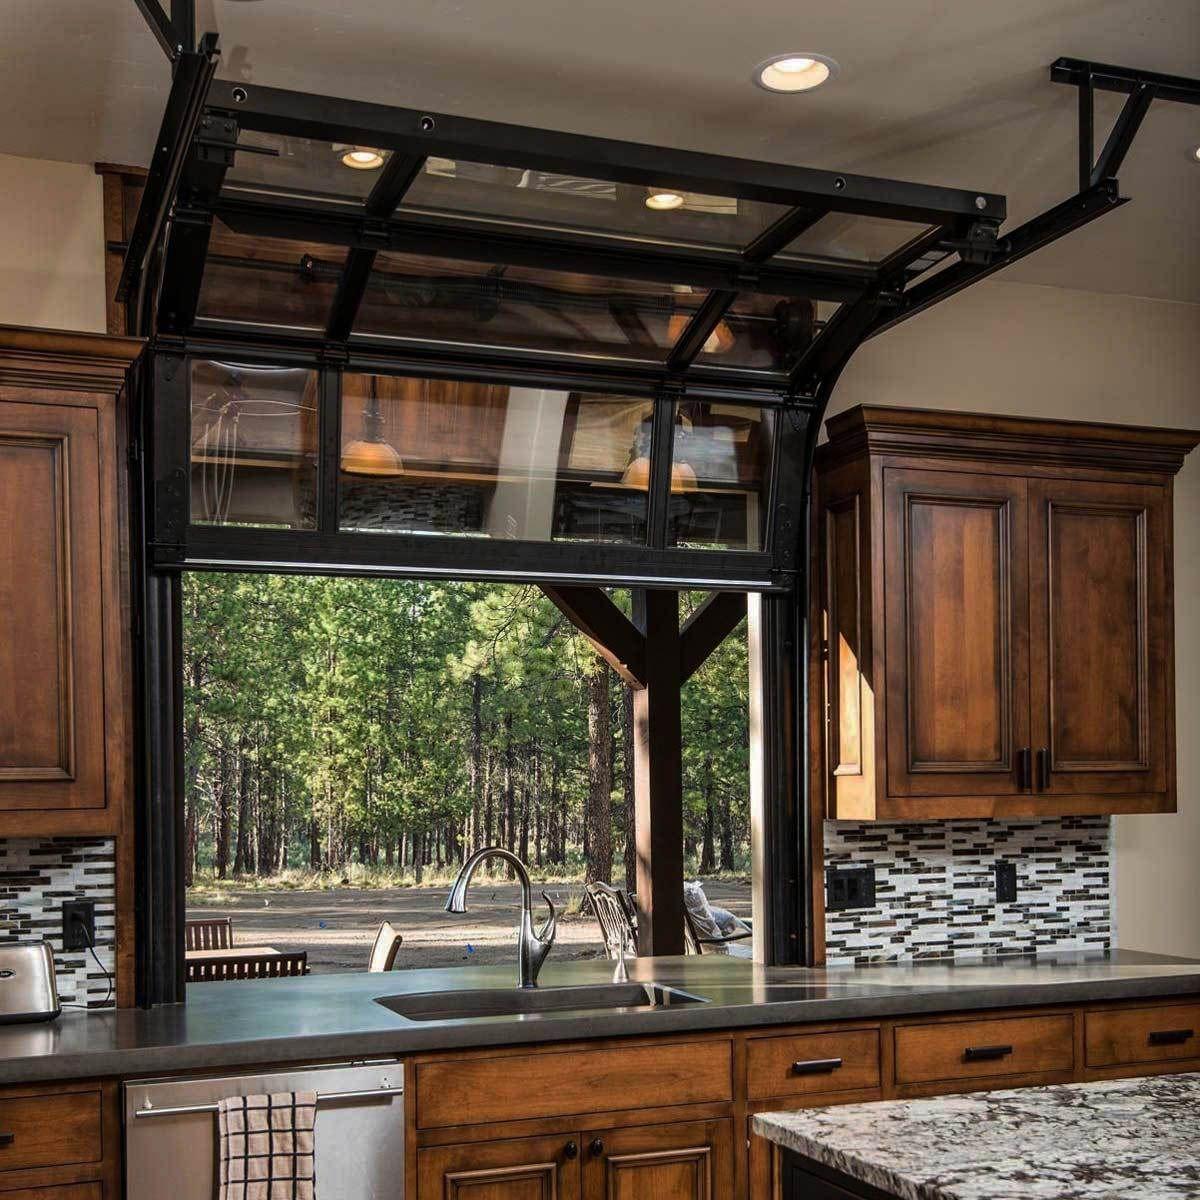 13 Artistic Outdoor Bar Concepts For Your Backyard Motivation Zeltahome Com Indoor Outdoor Kitchen Patio Bar Diy Outdoor Bar